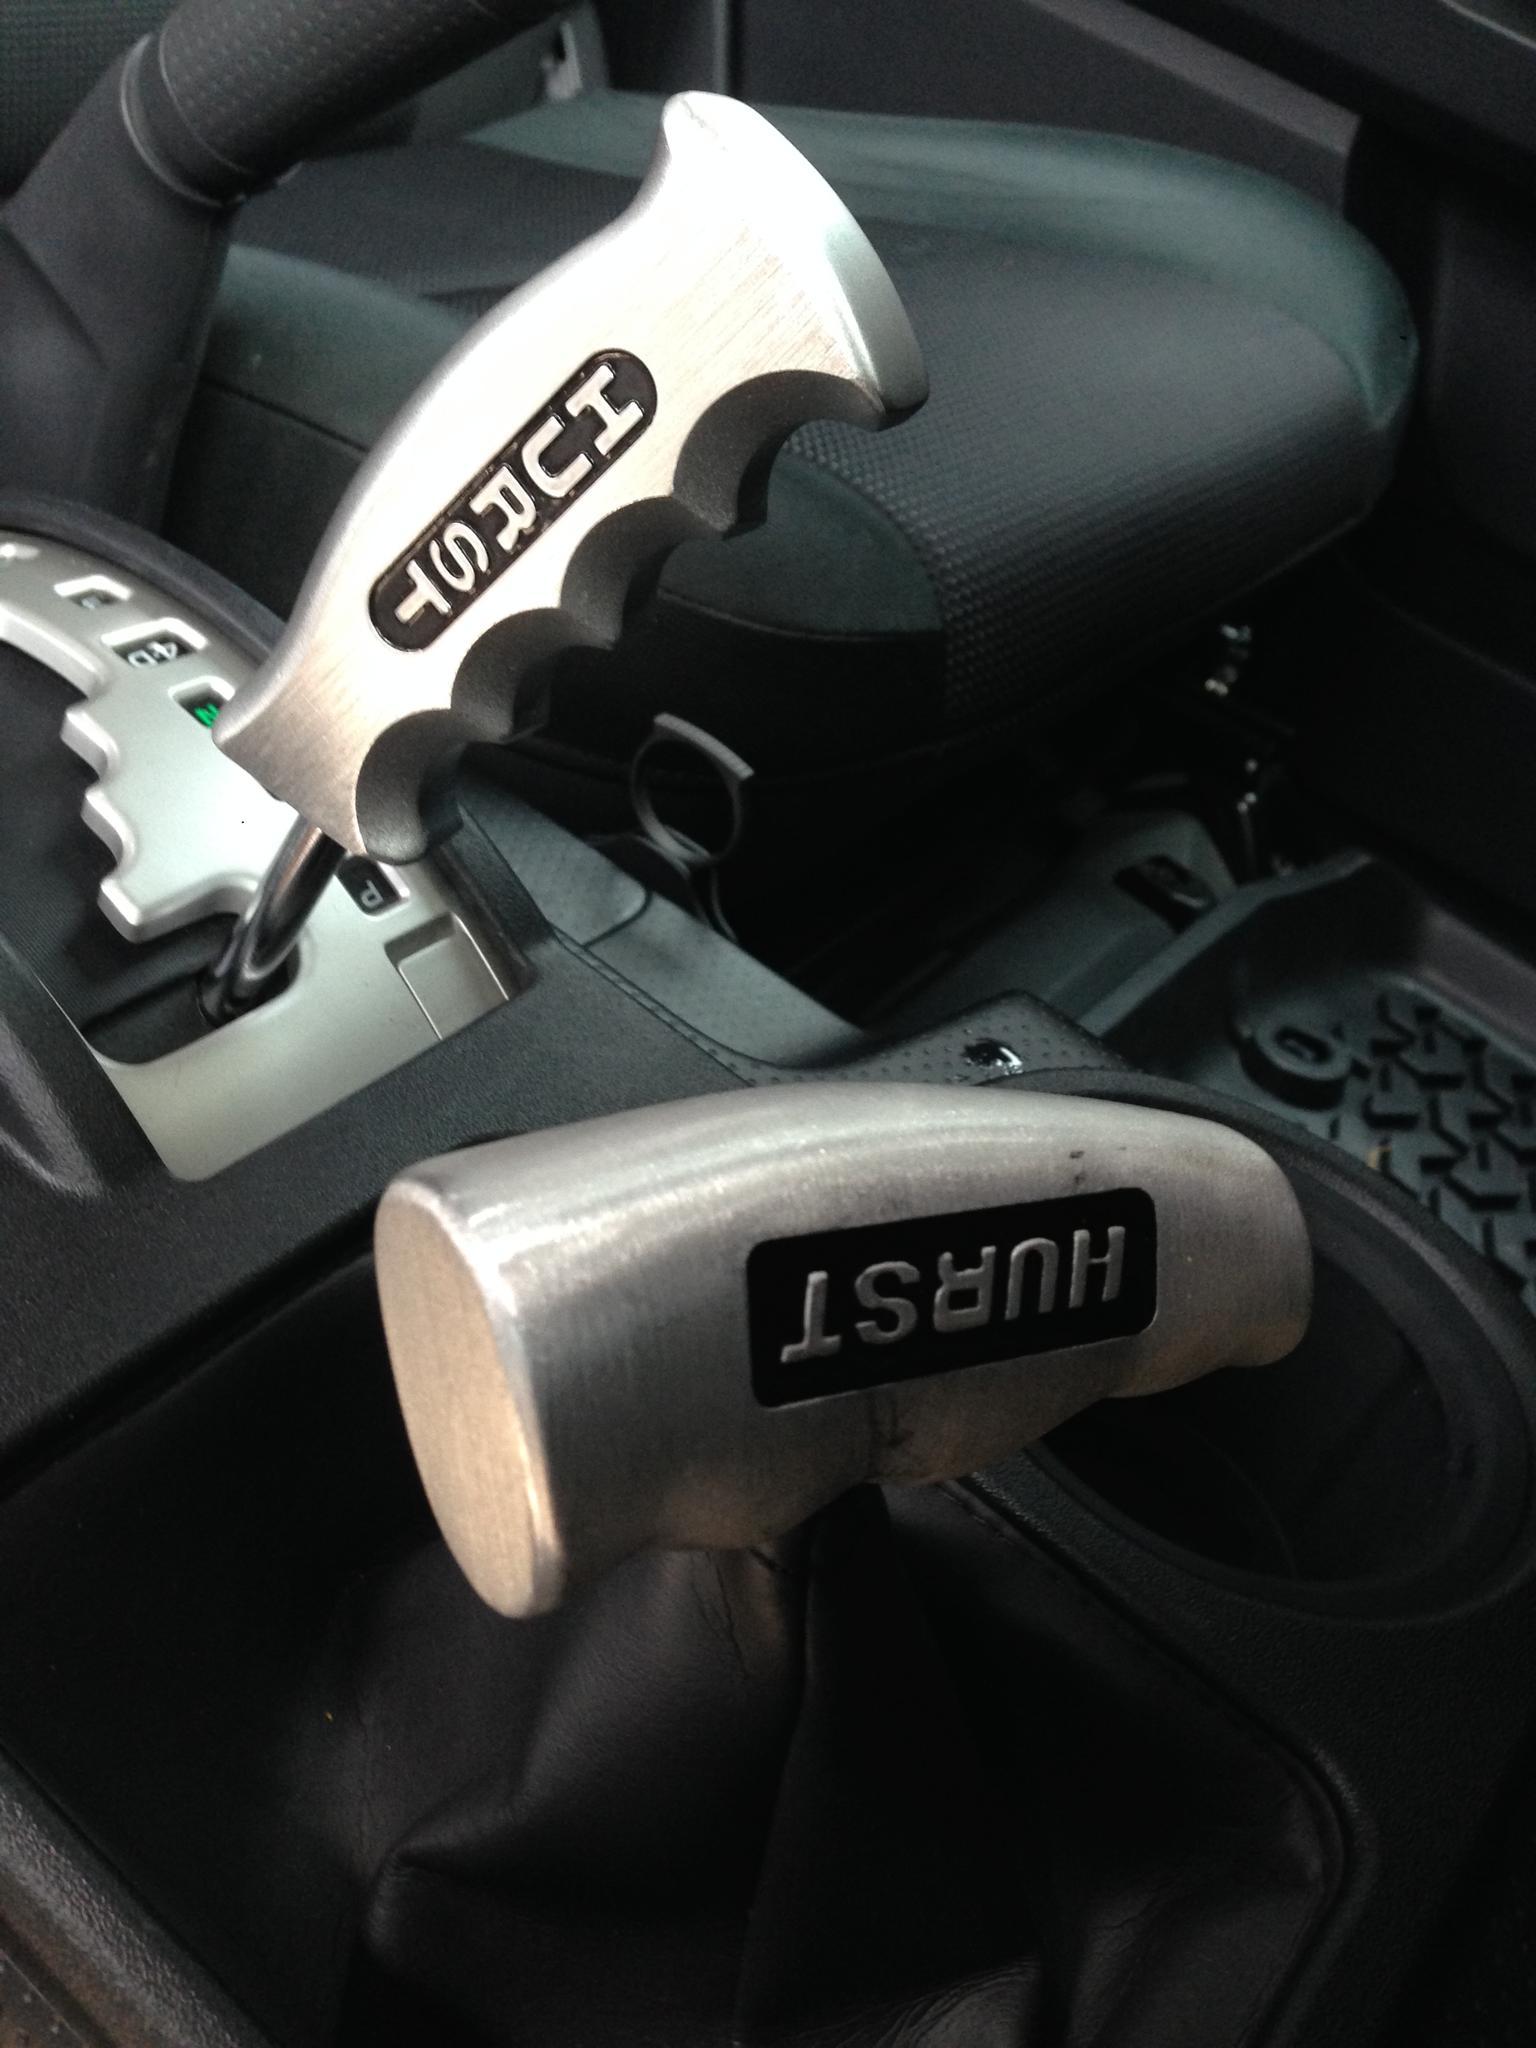 Lets see them custom SHIFT KNOBS - Page 3 - Toyota FJ